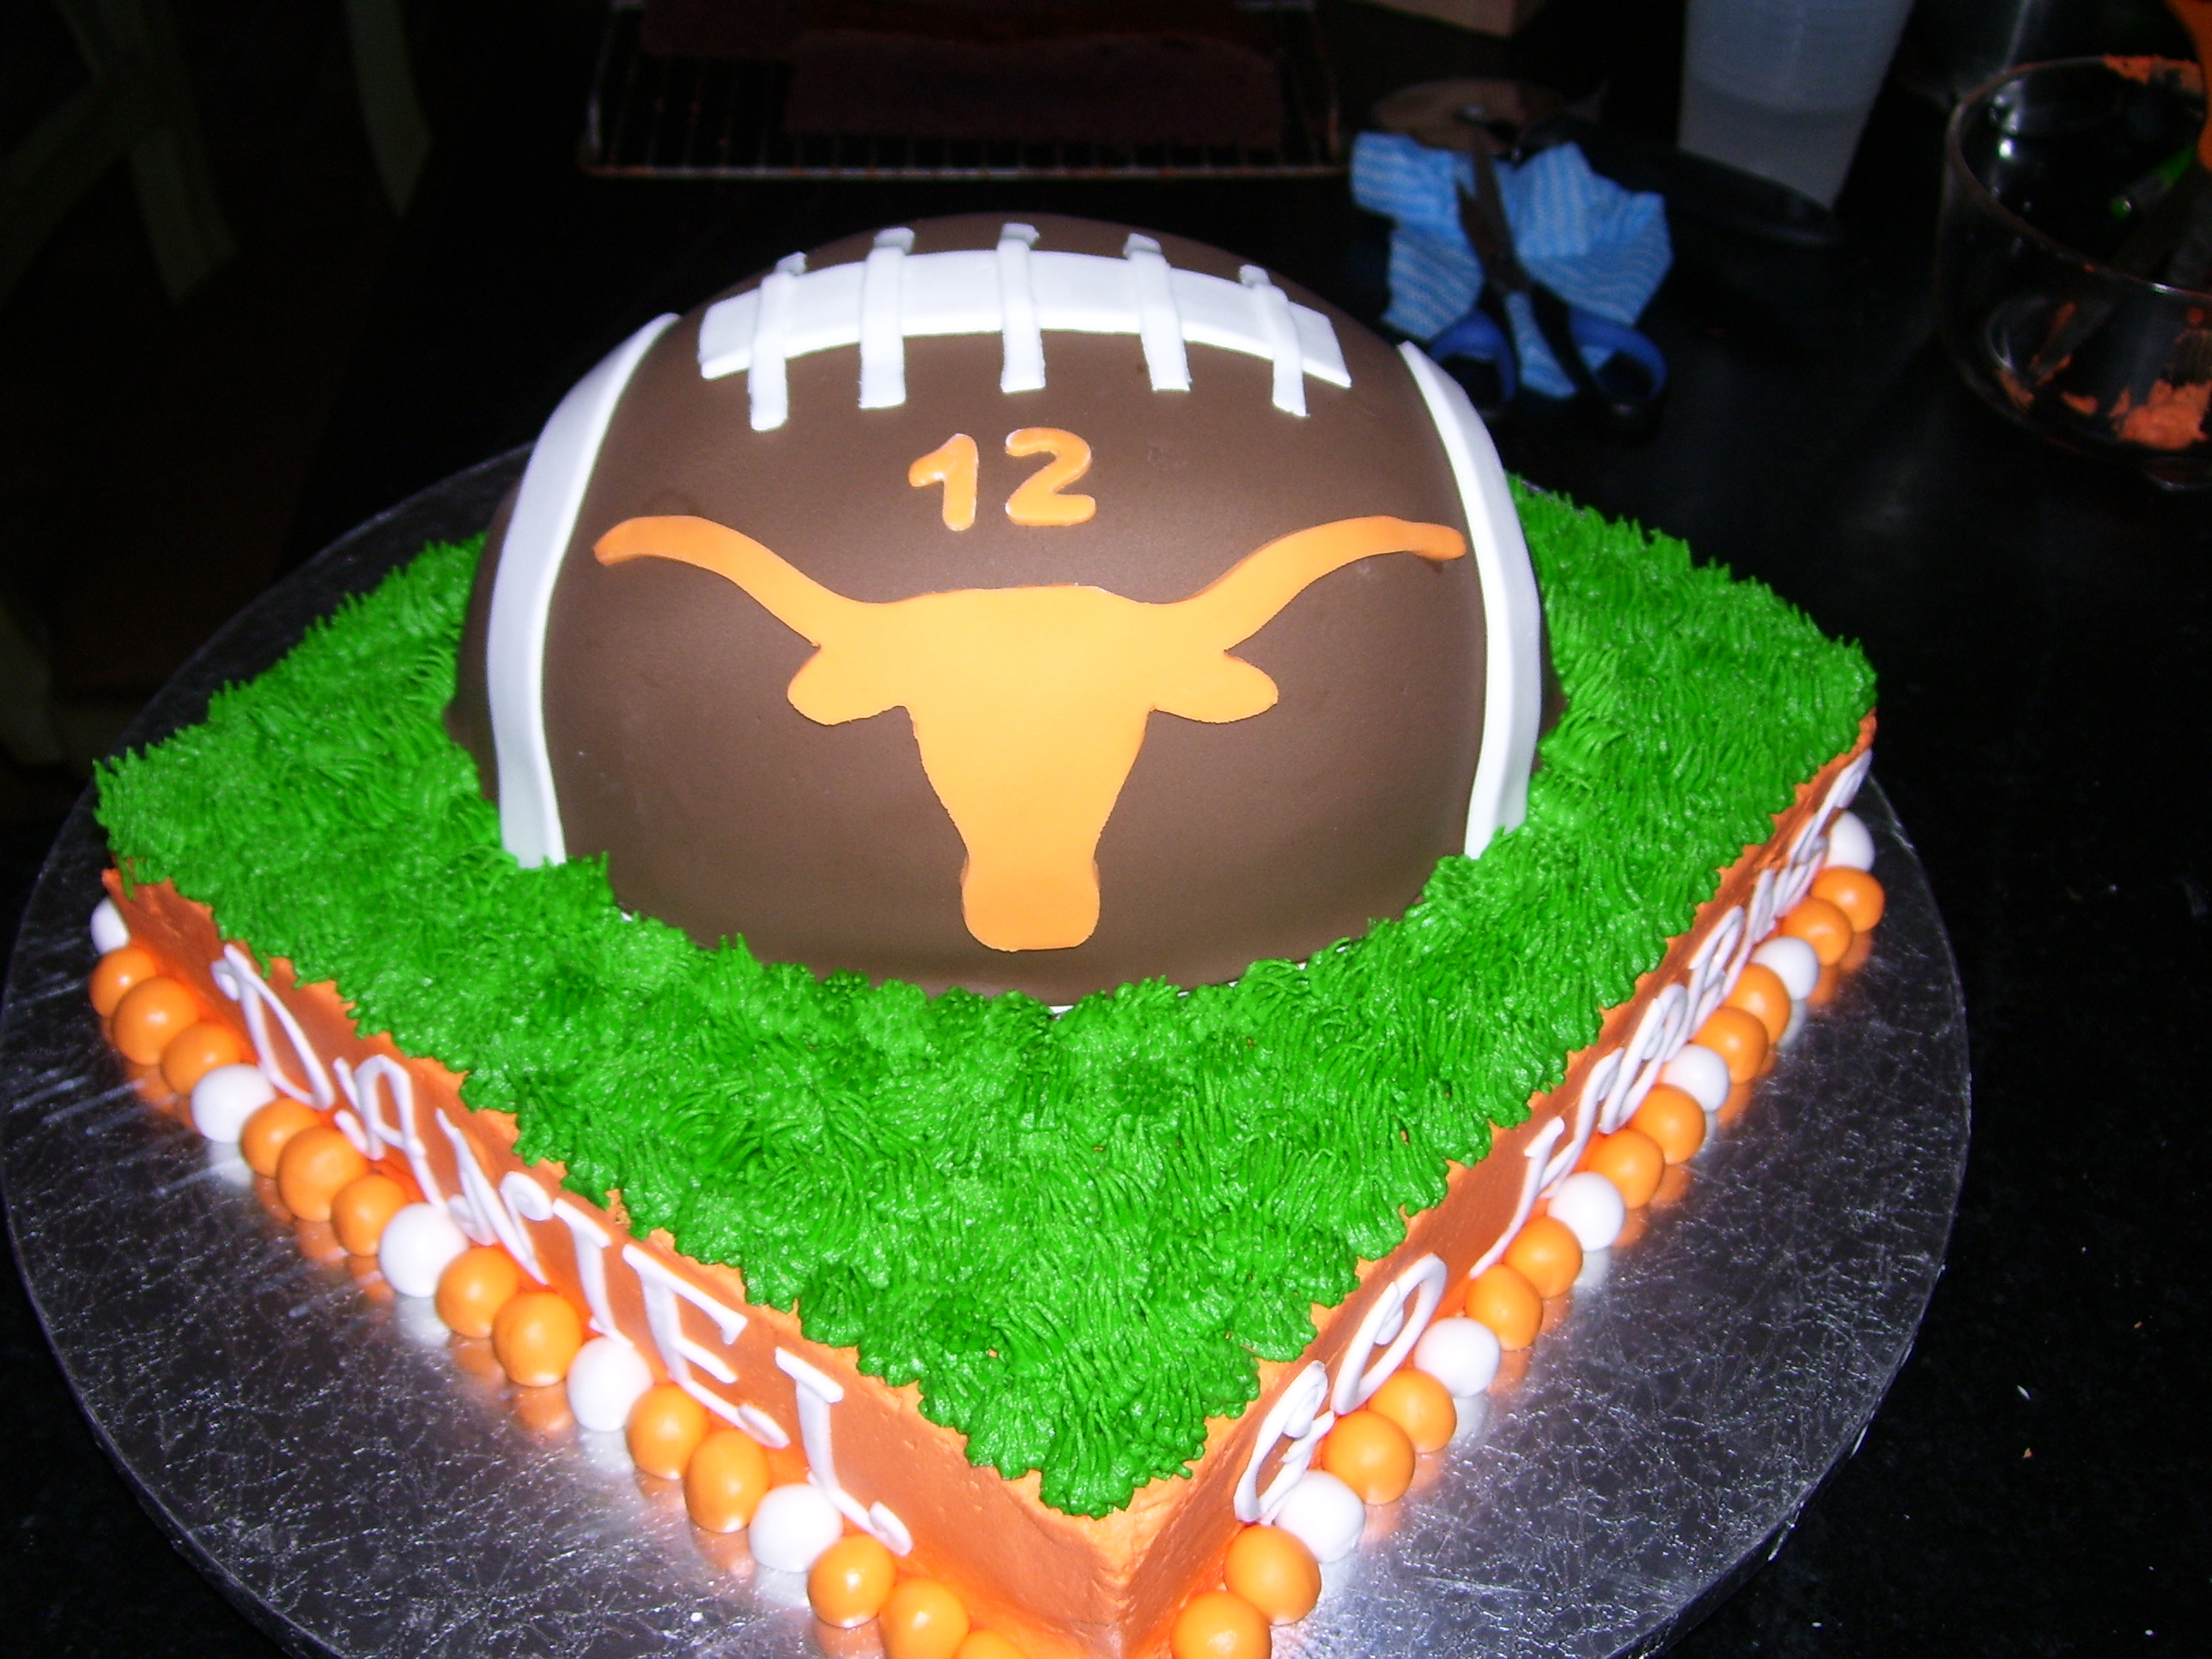 texas longhorn football birthday cake nfl picture texas longhorn 2576x1932